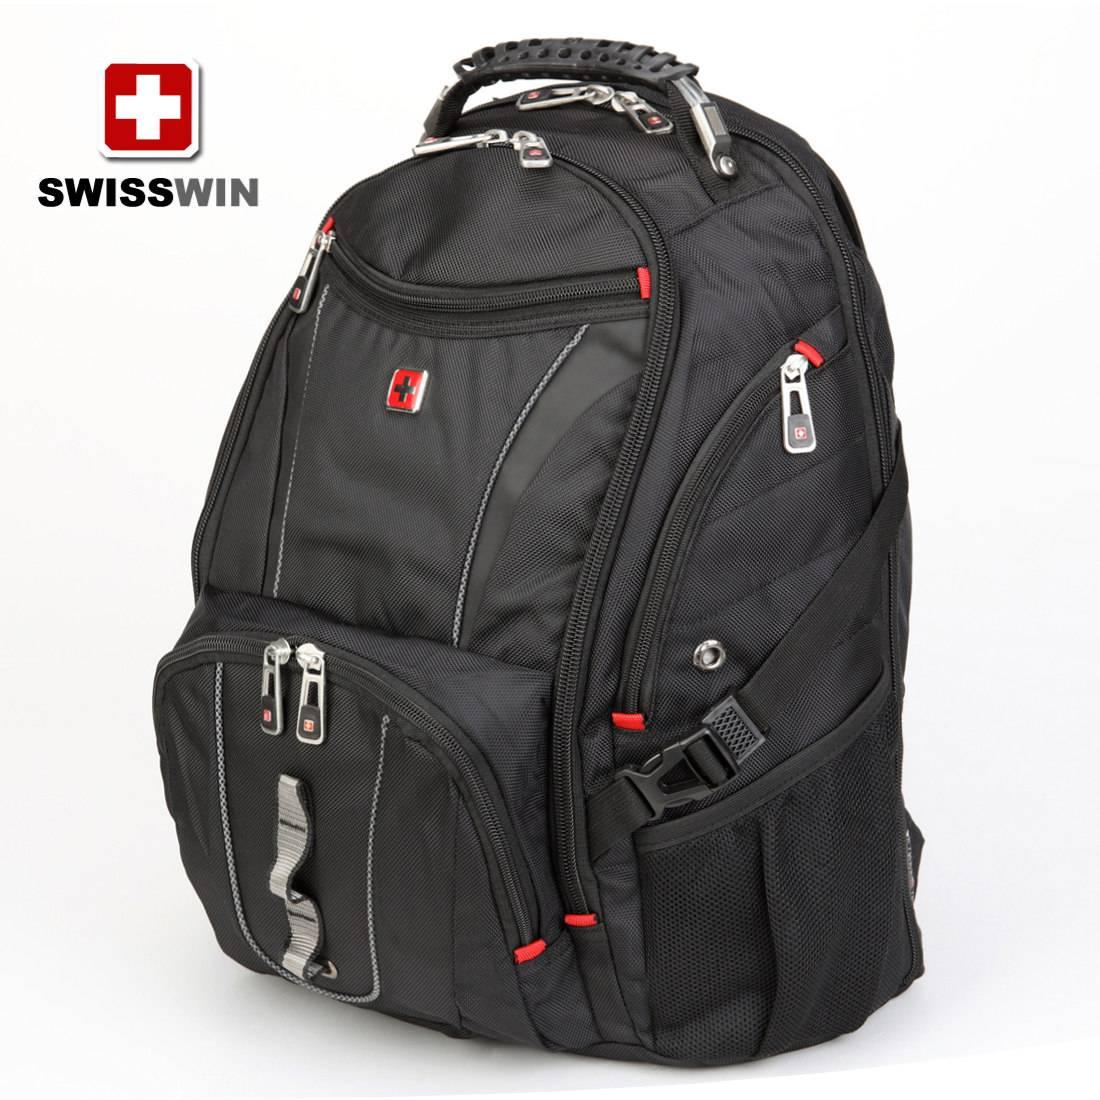 SWISSWIN Army Knife large capacity sports travel backpack computer backpack men's shoulder backpack